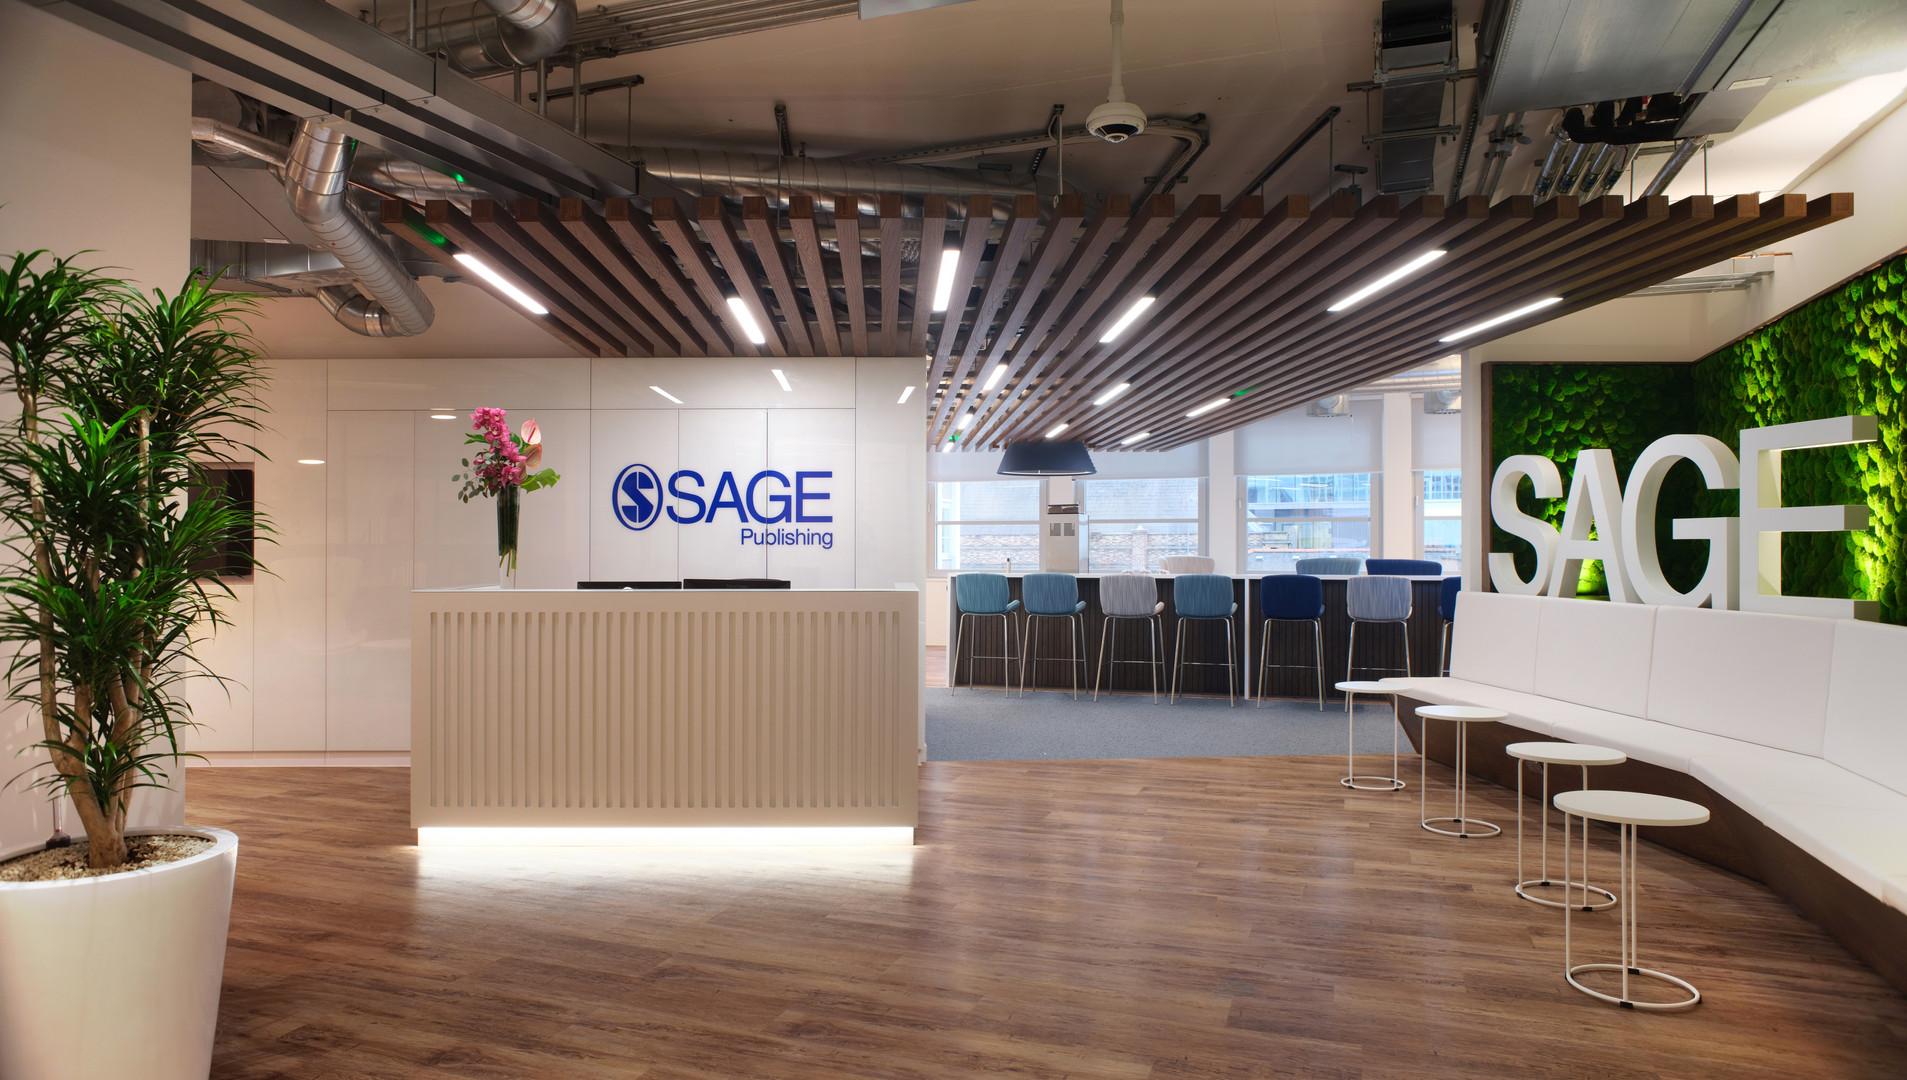 Sage Reception